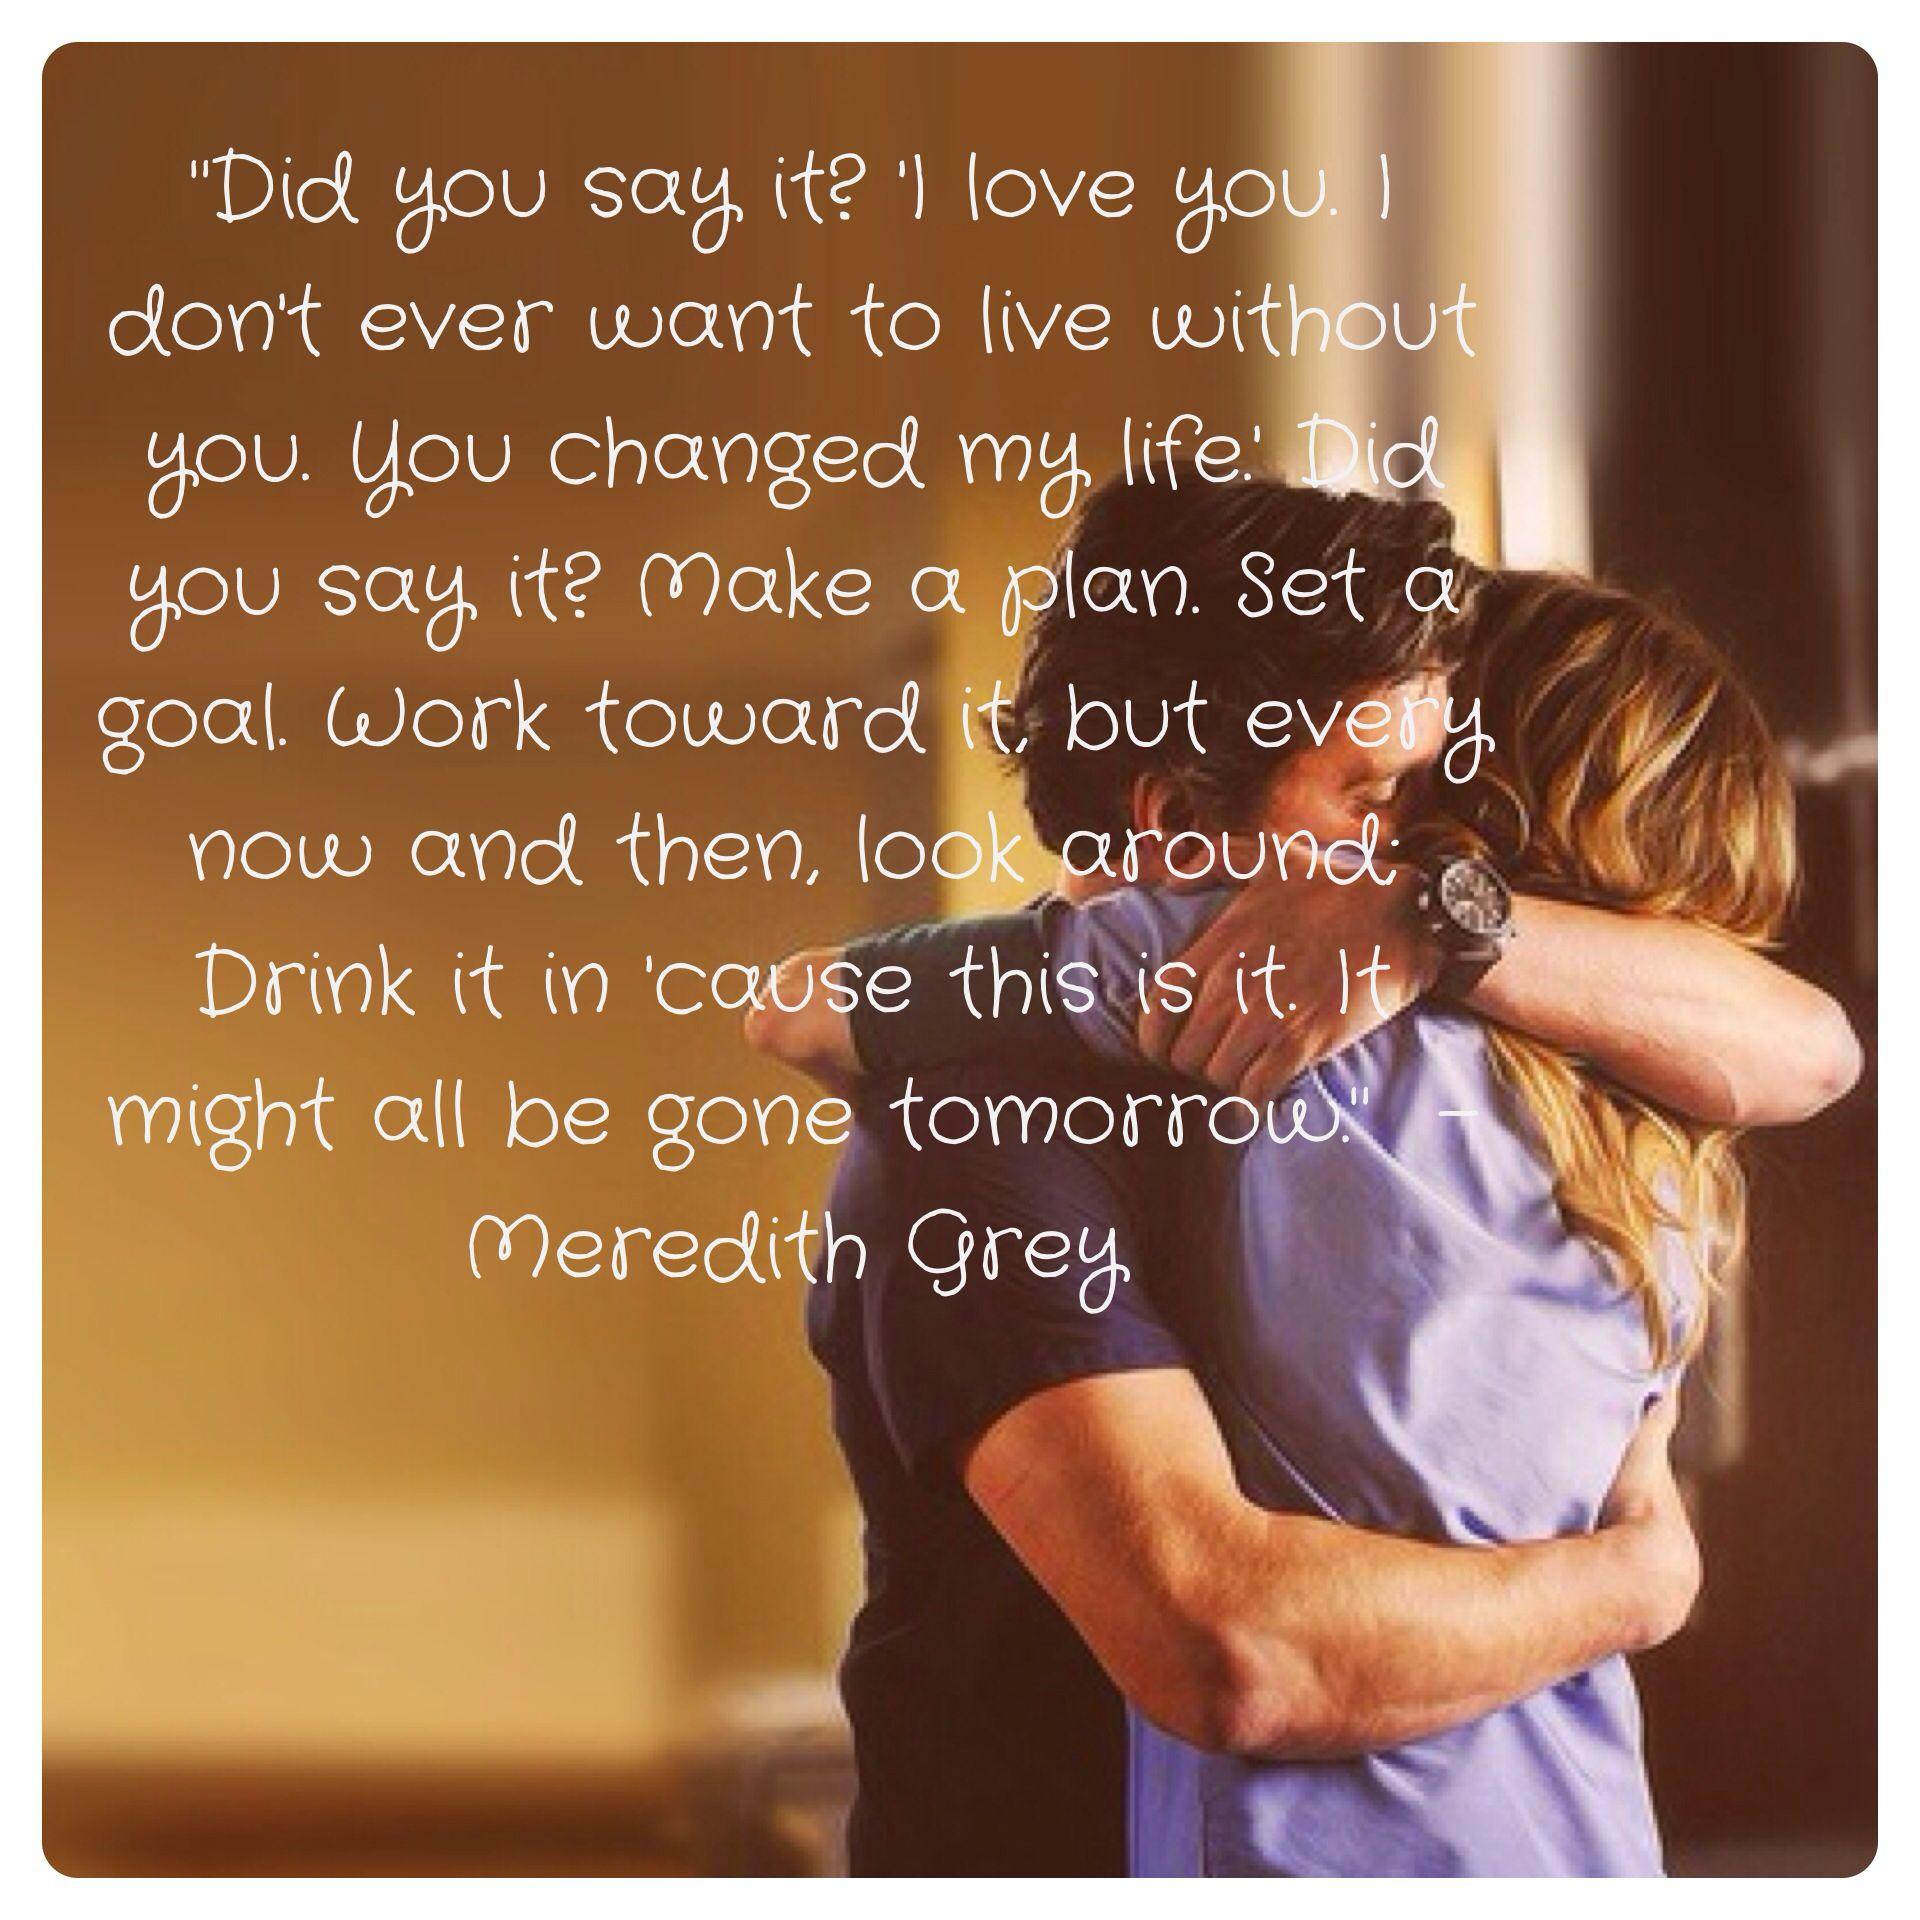 Quotes - Meredith Grey - Grey\'s Anatomy | quotes | Pinterest ...